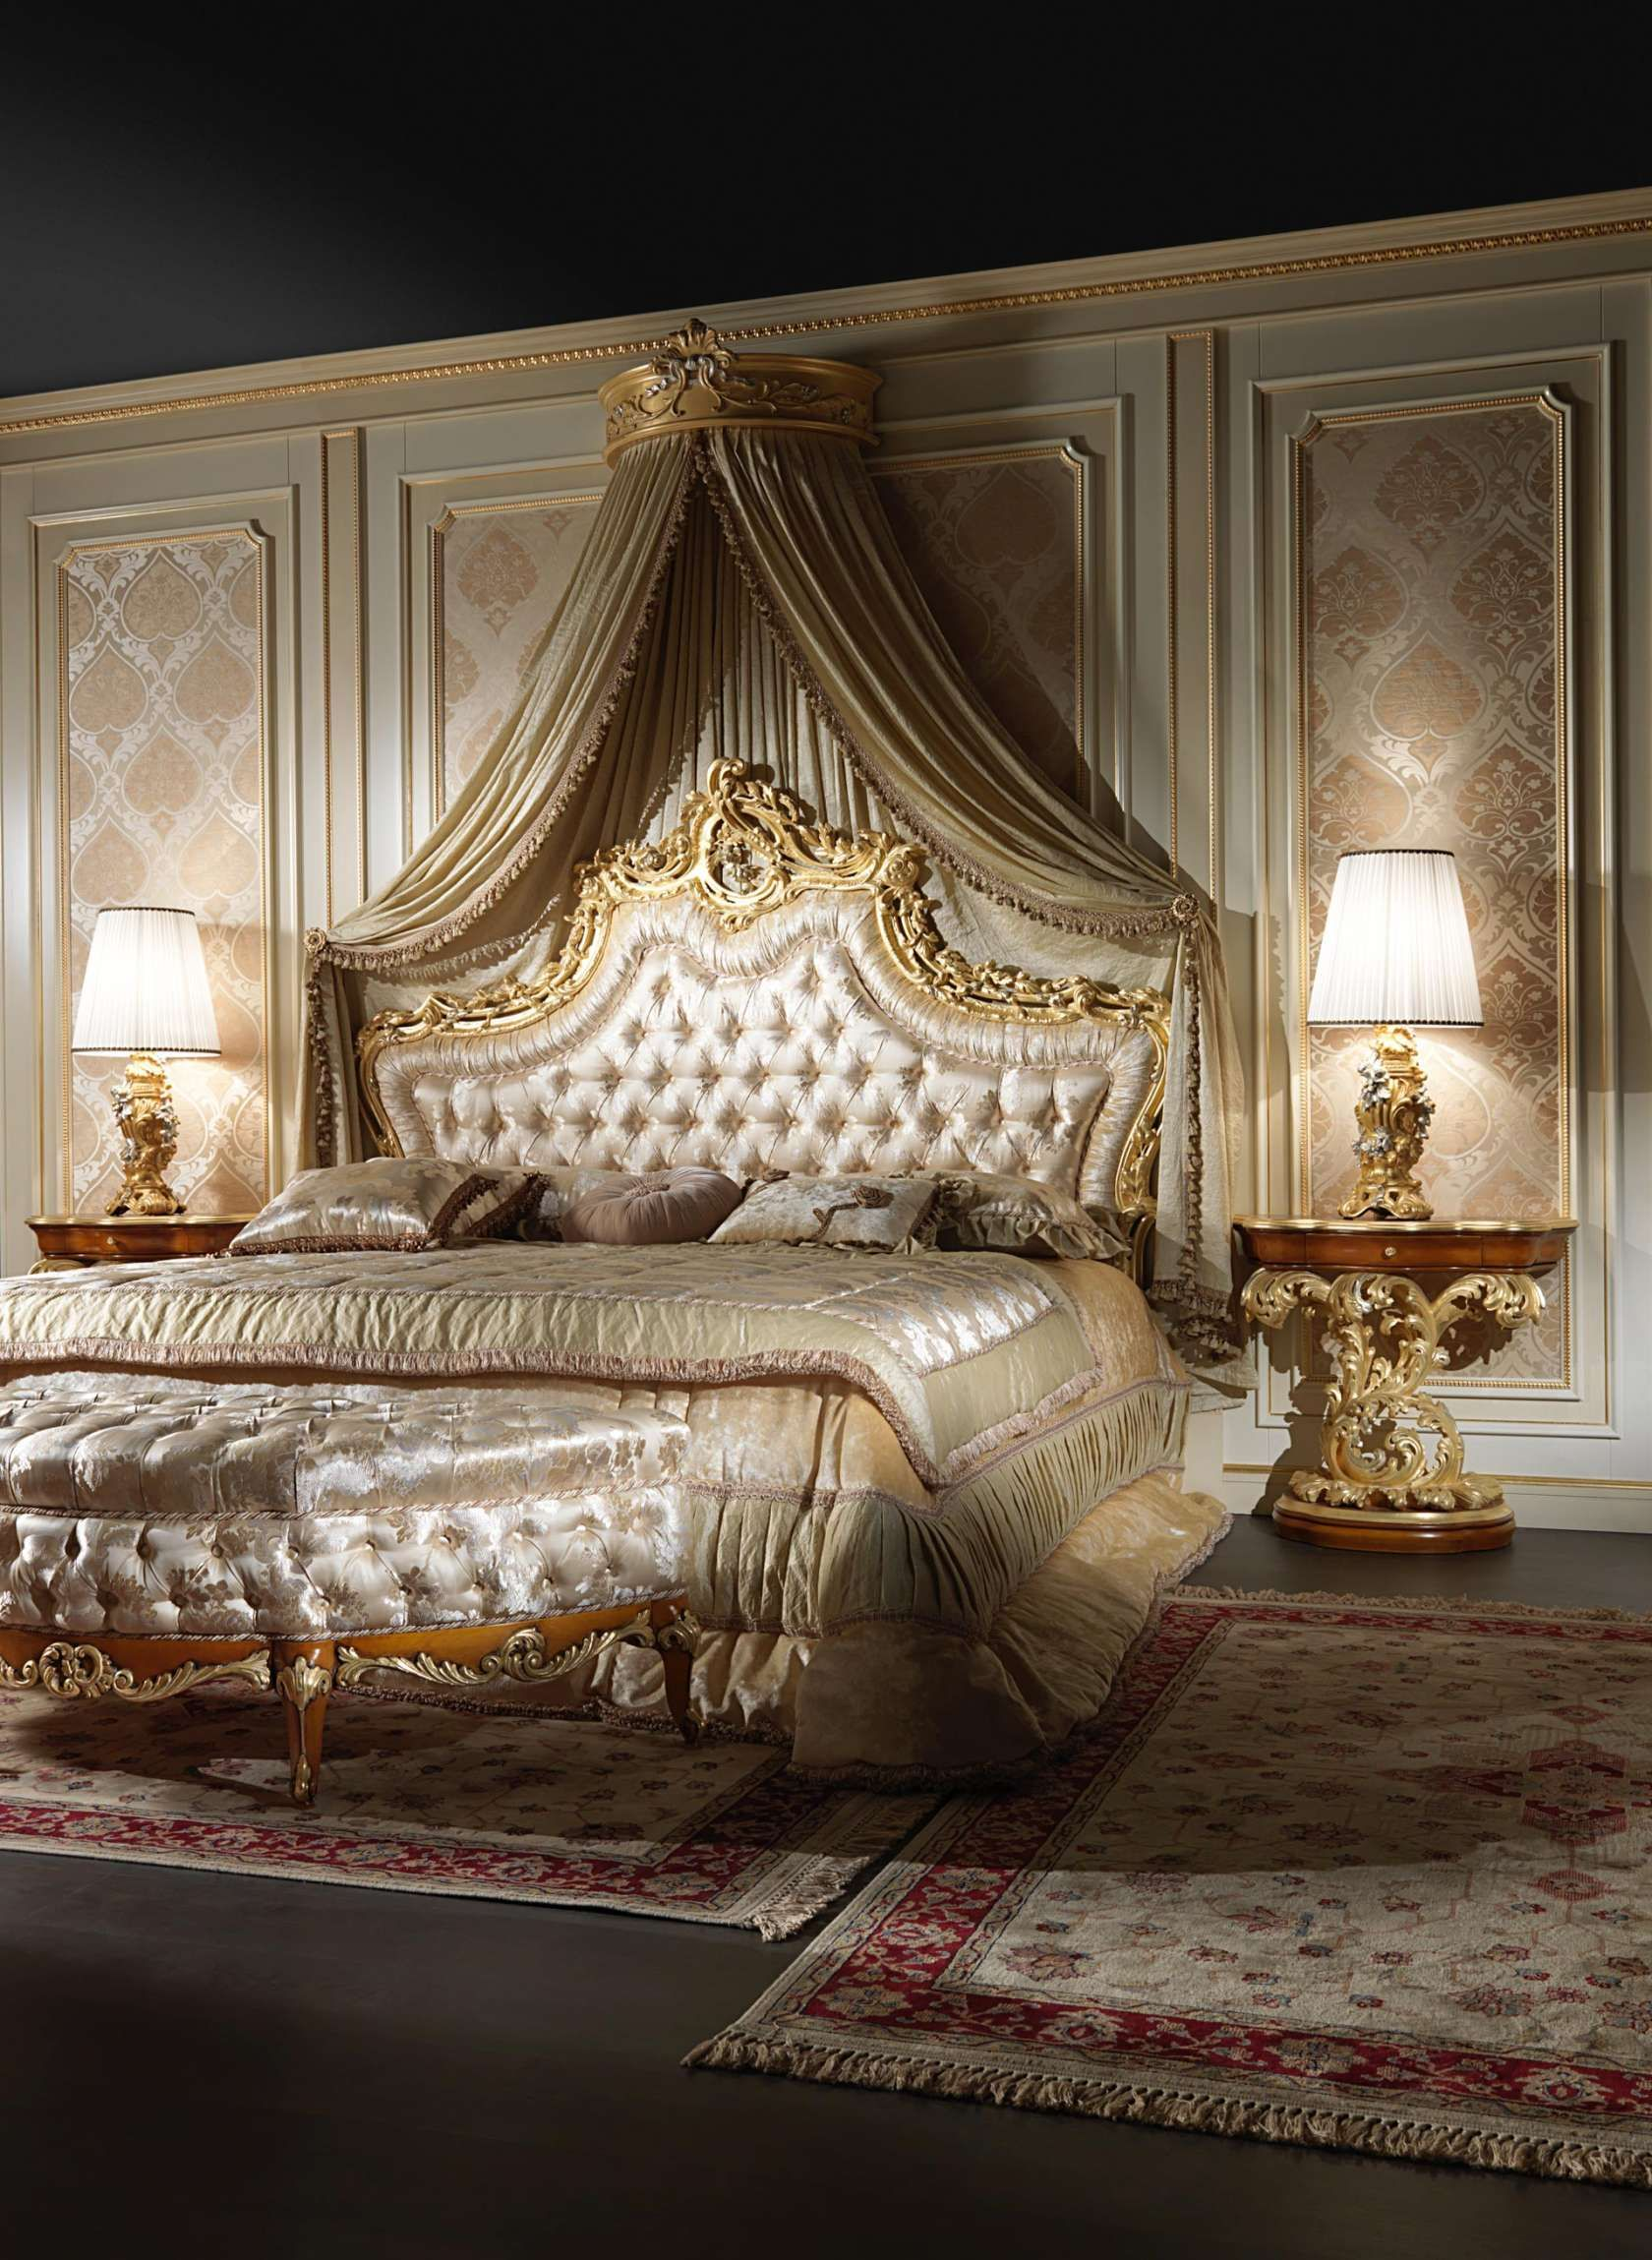 Baroque Bedroom Furniture Art 2017 Roman Style Vimercati Clic